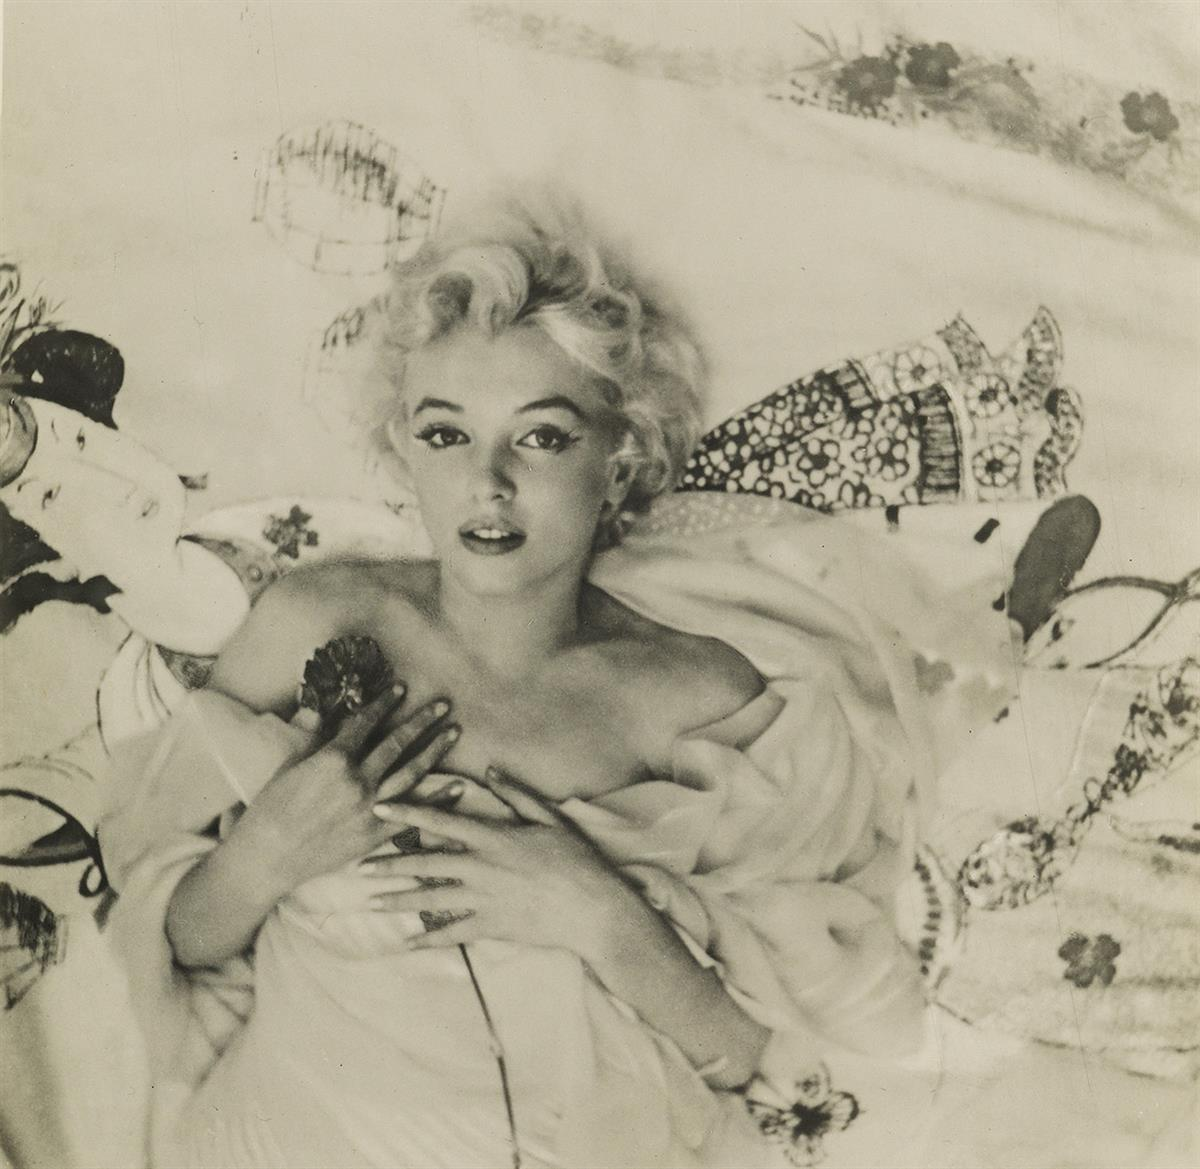 CECIL BEATON (1904-1980) Marilyn Monroe.